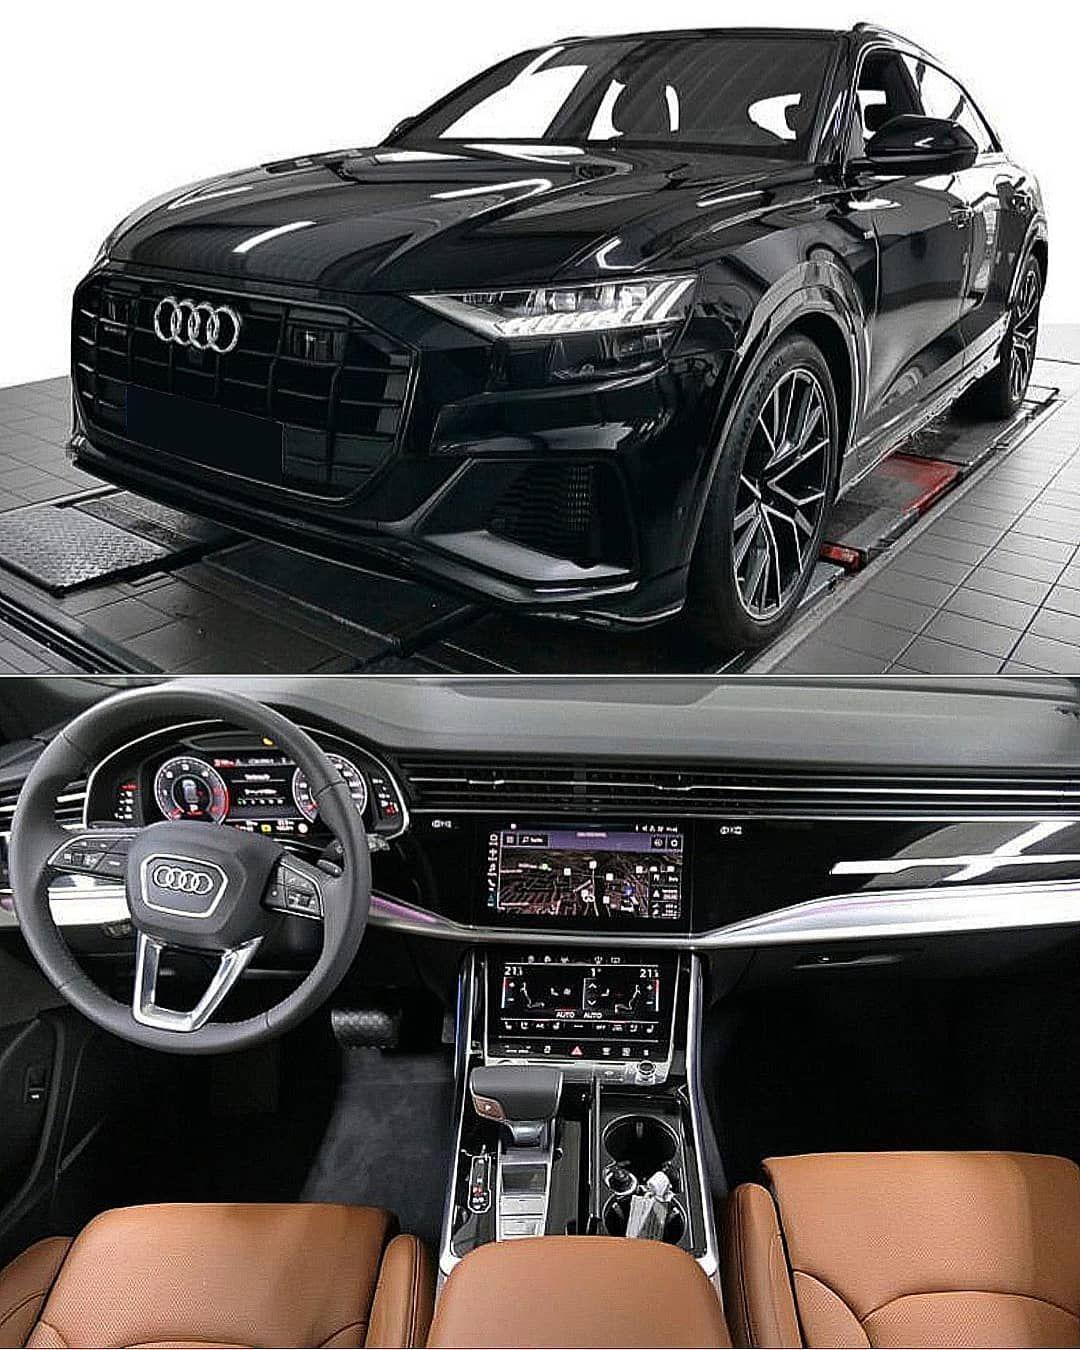 Audi Q8 On Instagram Black Cognac Q8 Audi Lovers Q8nation Audi